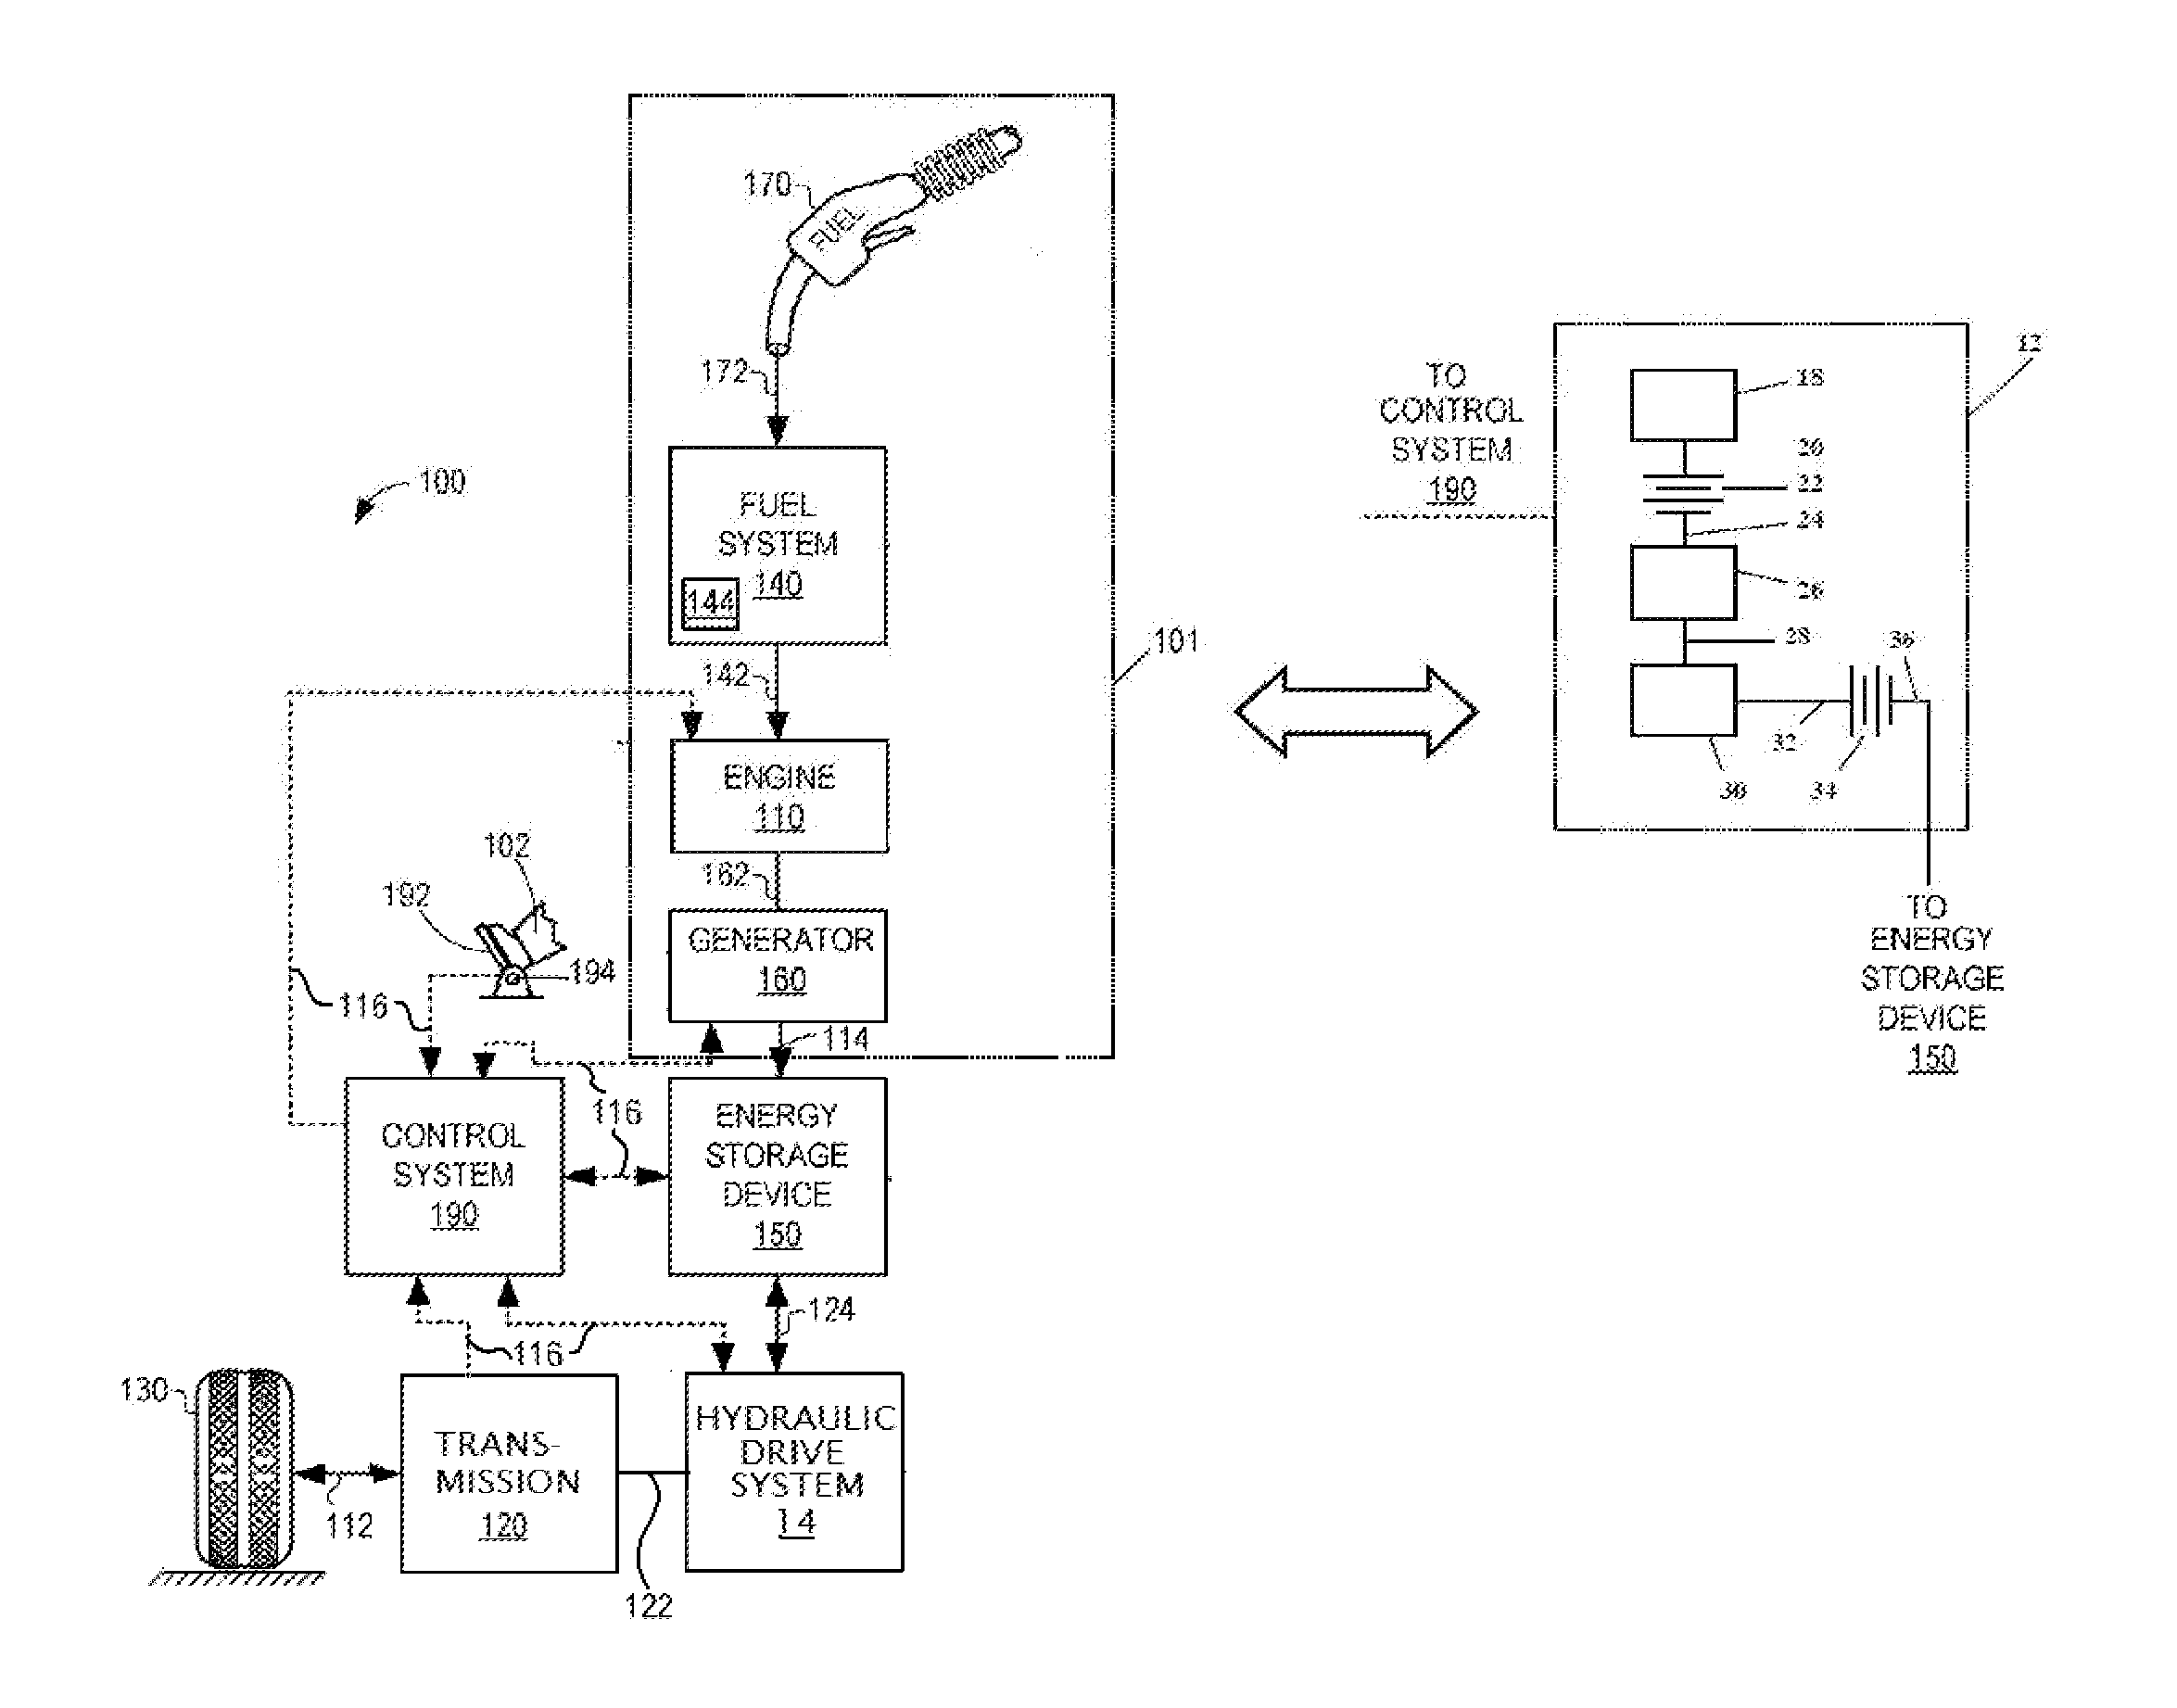 Worcester Boiler: S Plan Wiring Diagram Worcester Boiler